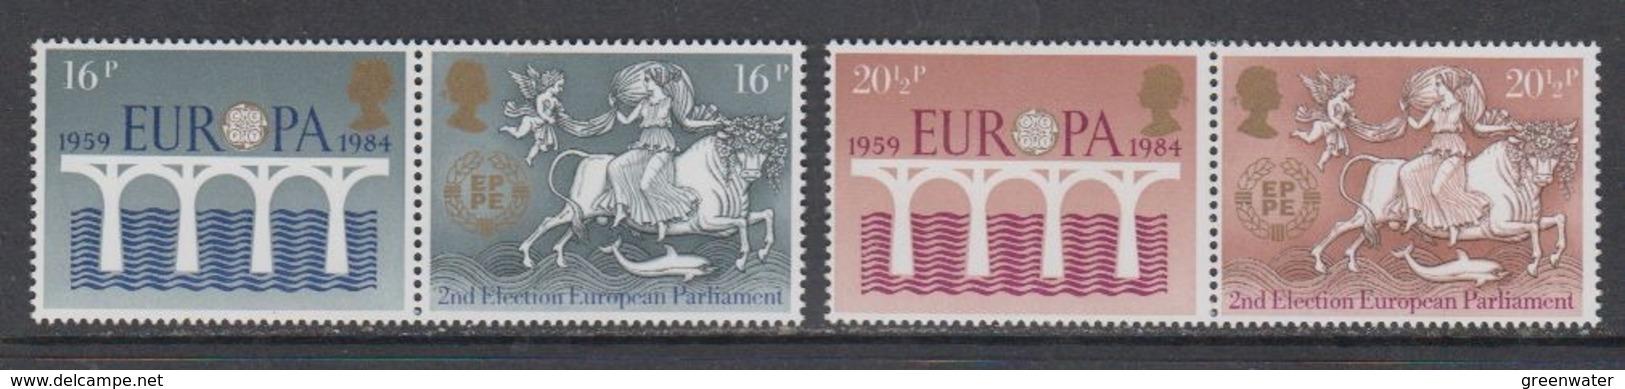 Europa Cept 1984 Great Britain 4v  (complete Set)  ** Mnh  (45111) - Europa-CEPT